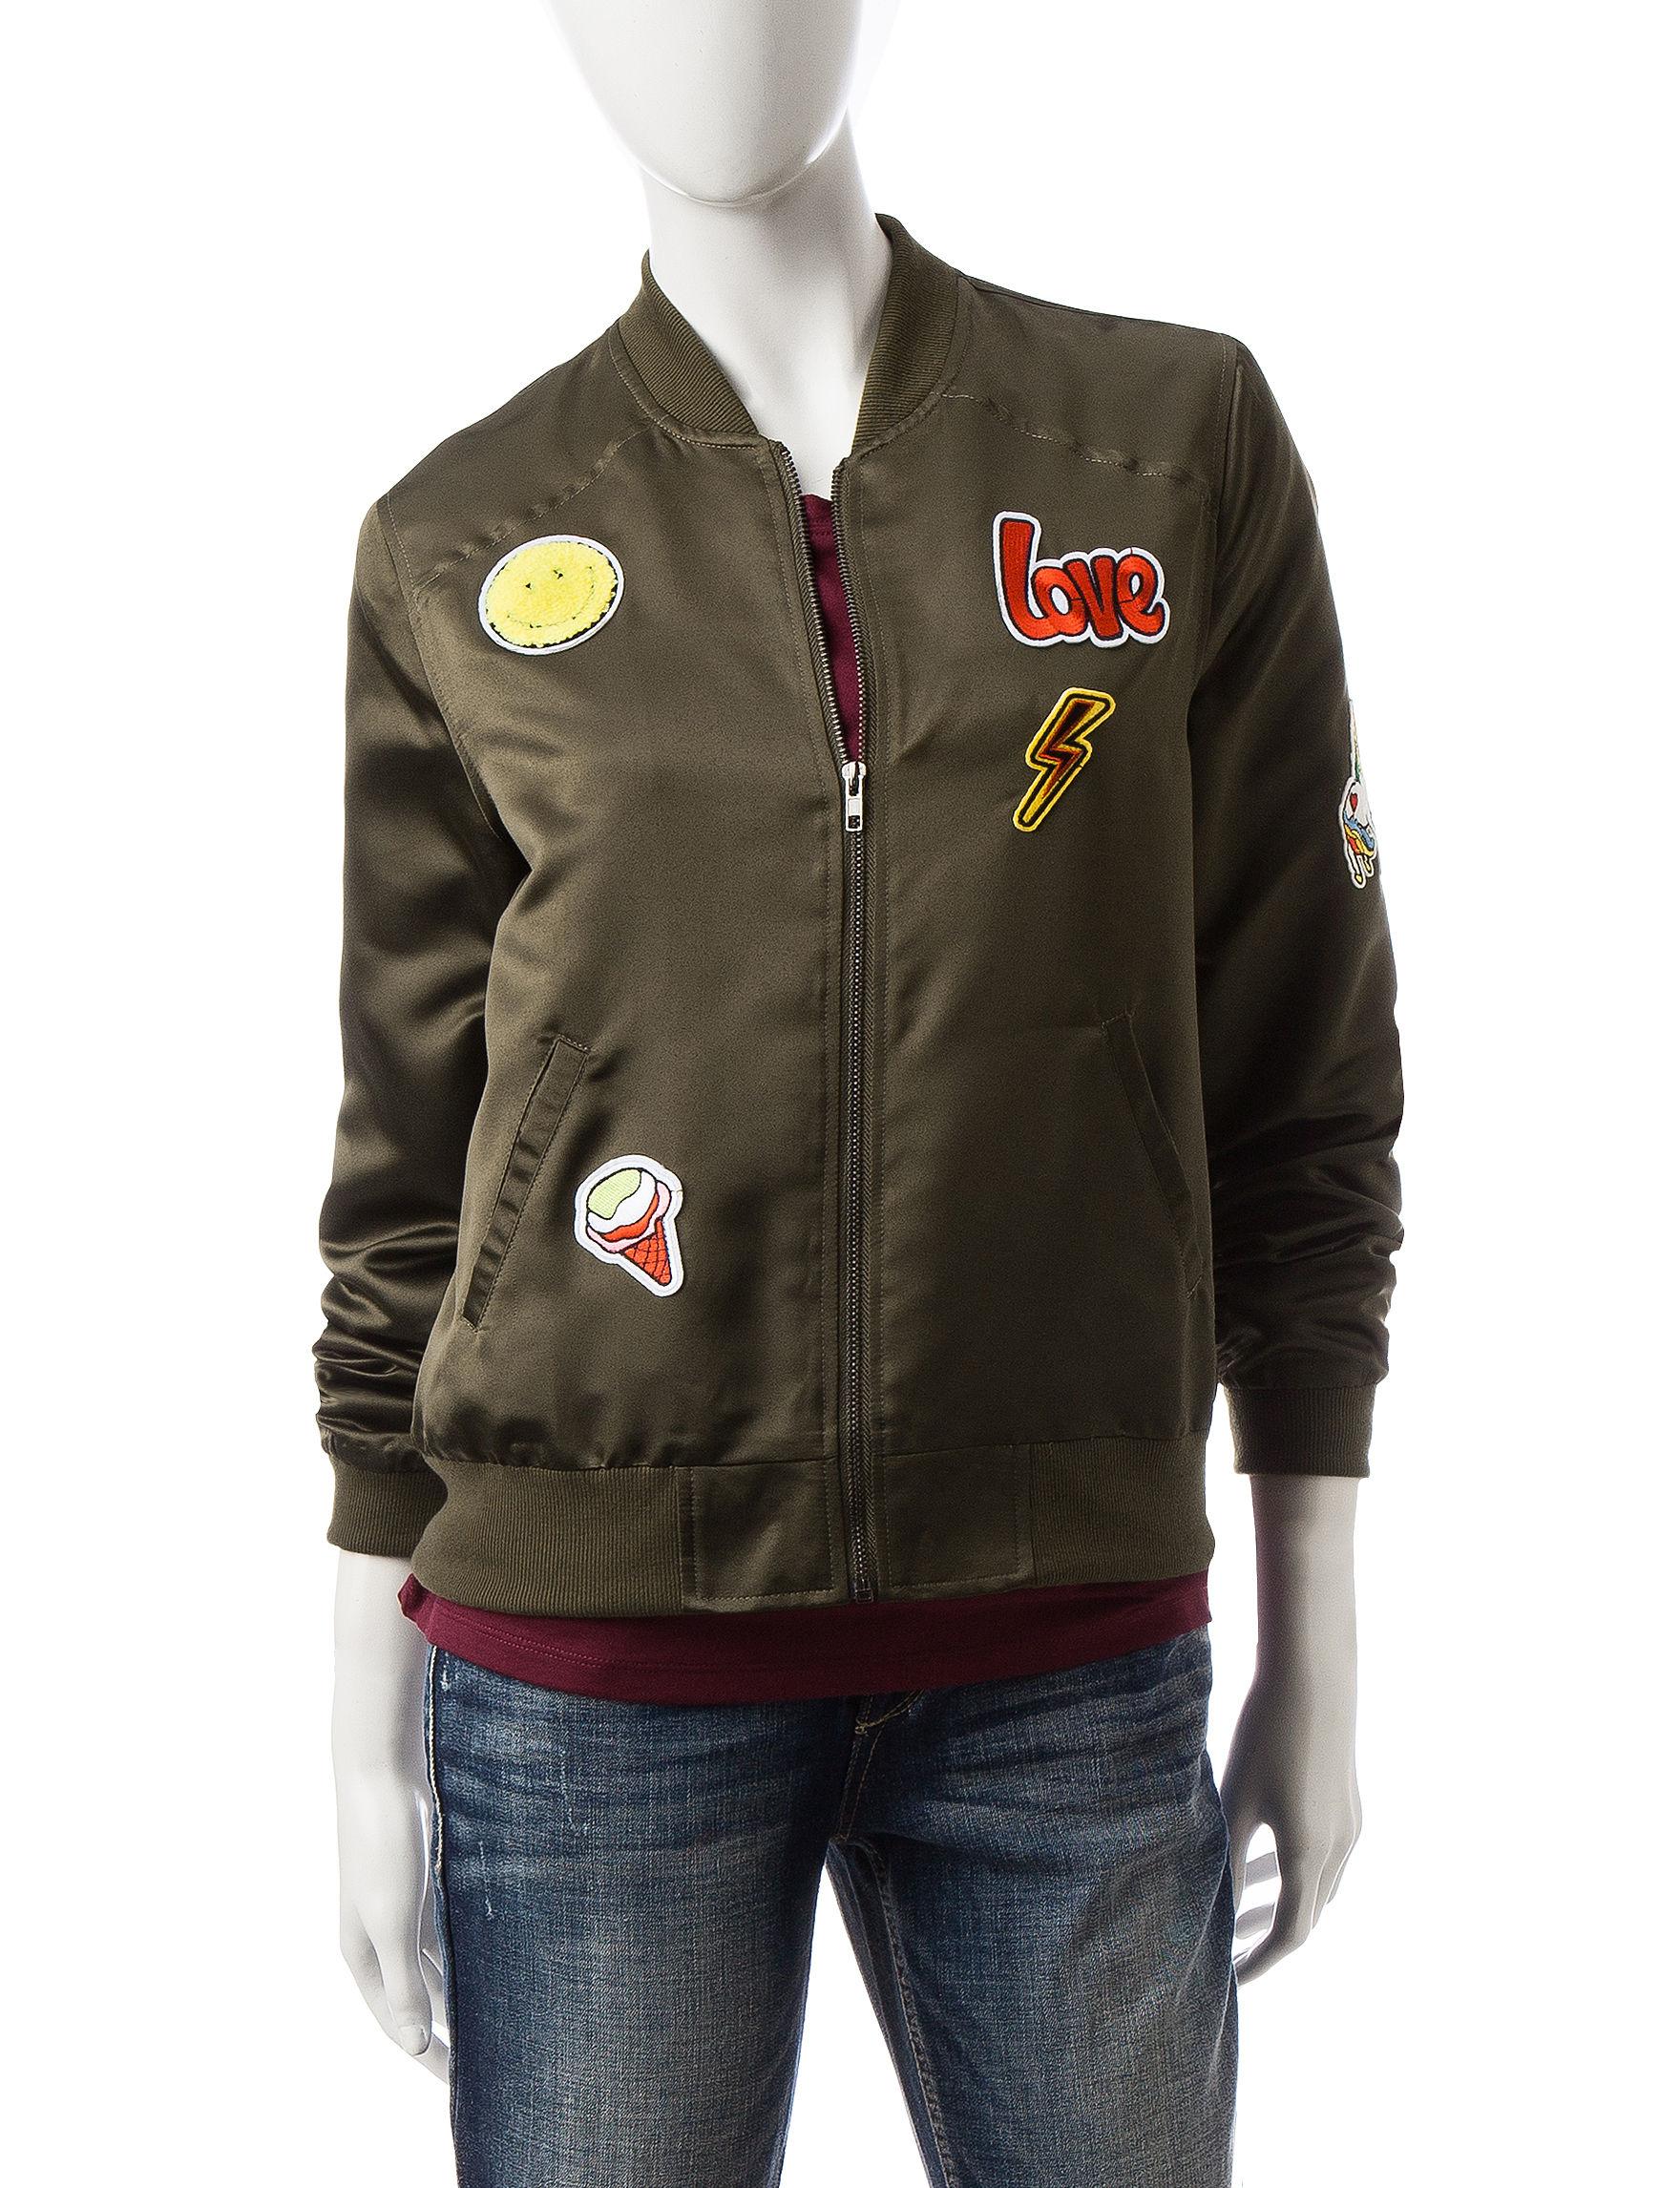 Justify Purple Lightweight Jackets & Blazers